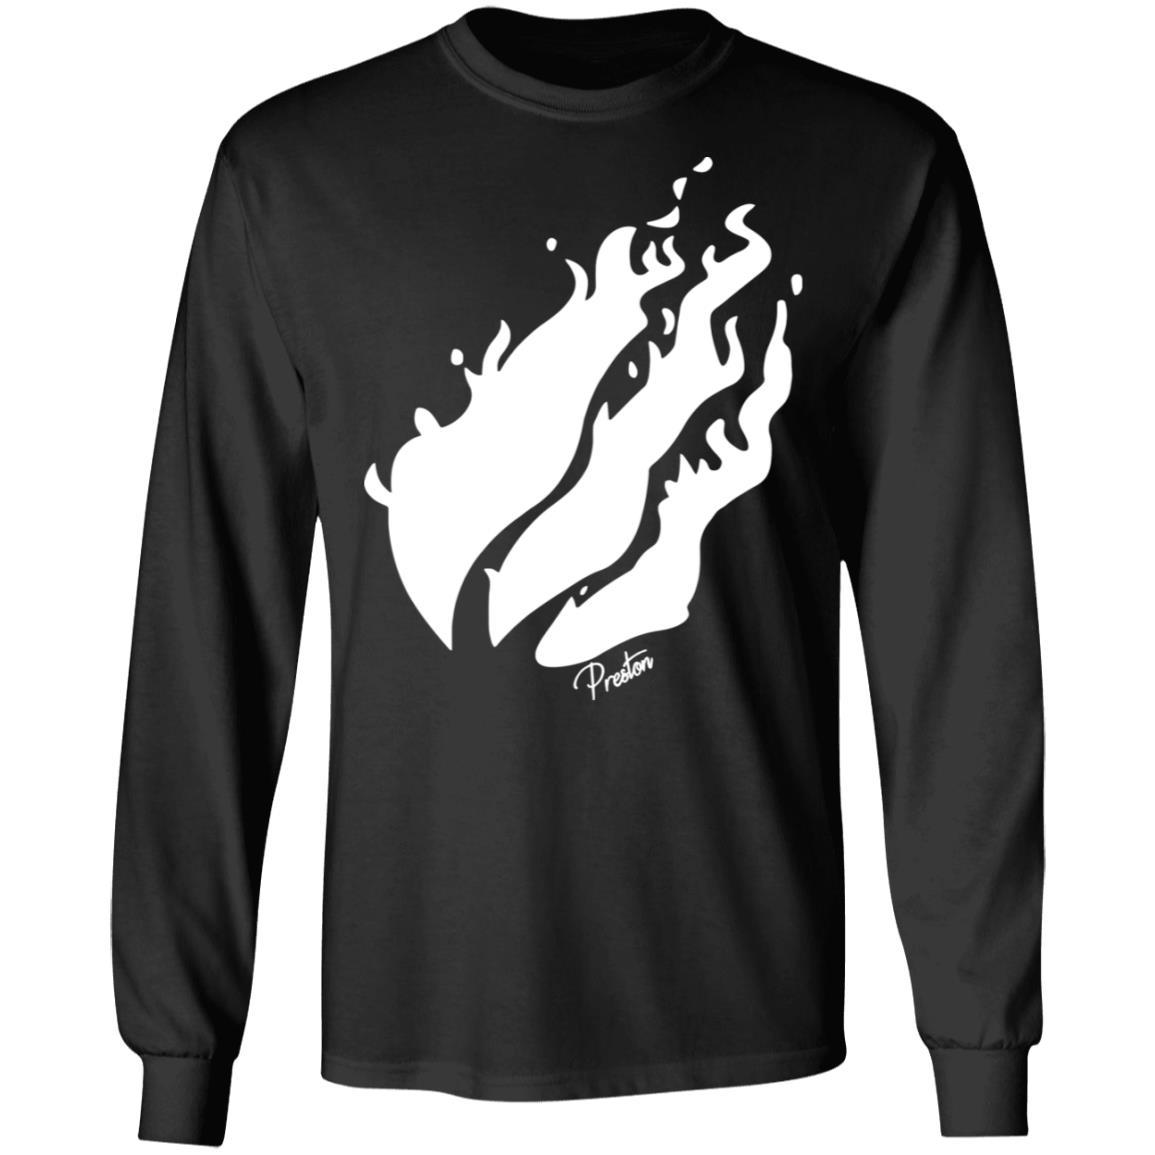 Preston Merch Black Hoodie White Flame Fire Logo - Tipatee